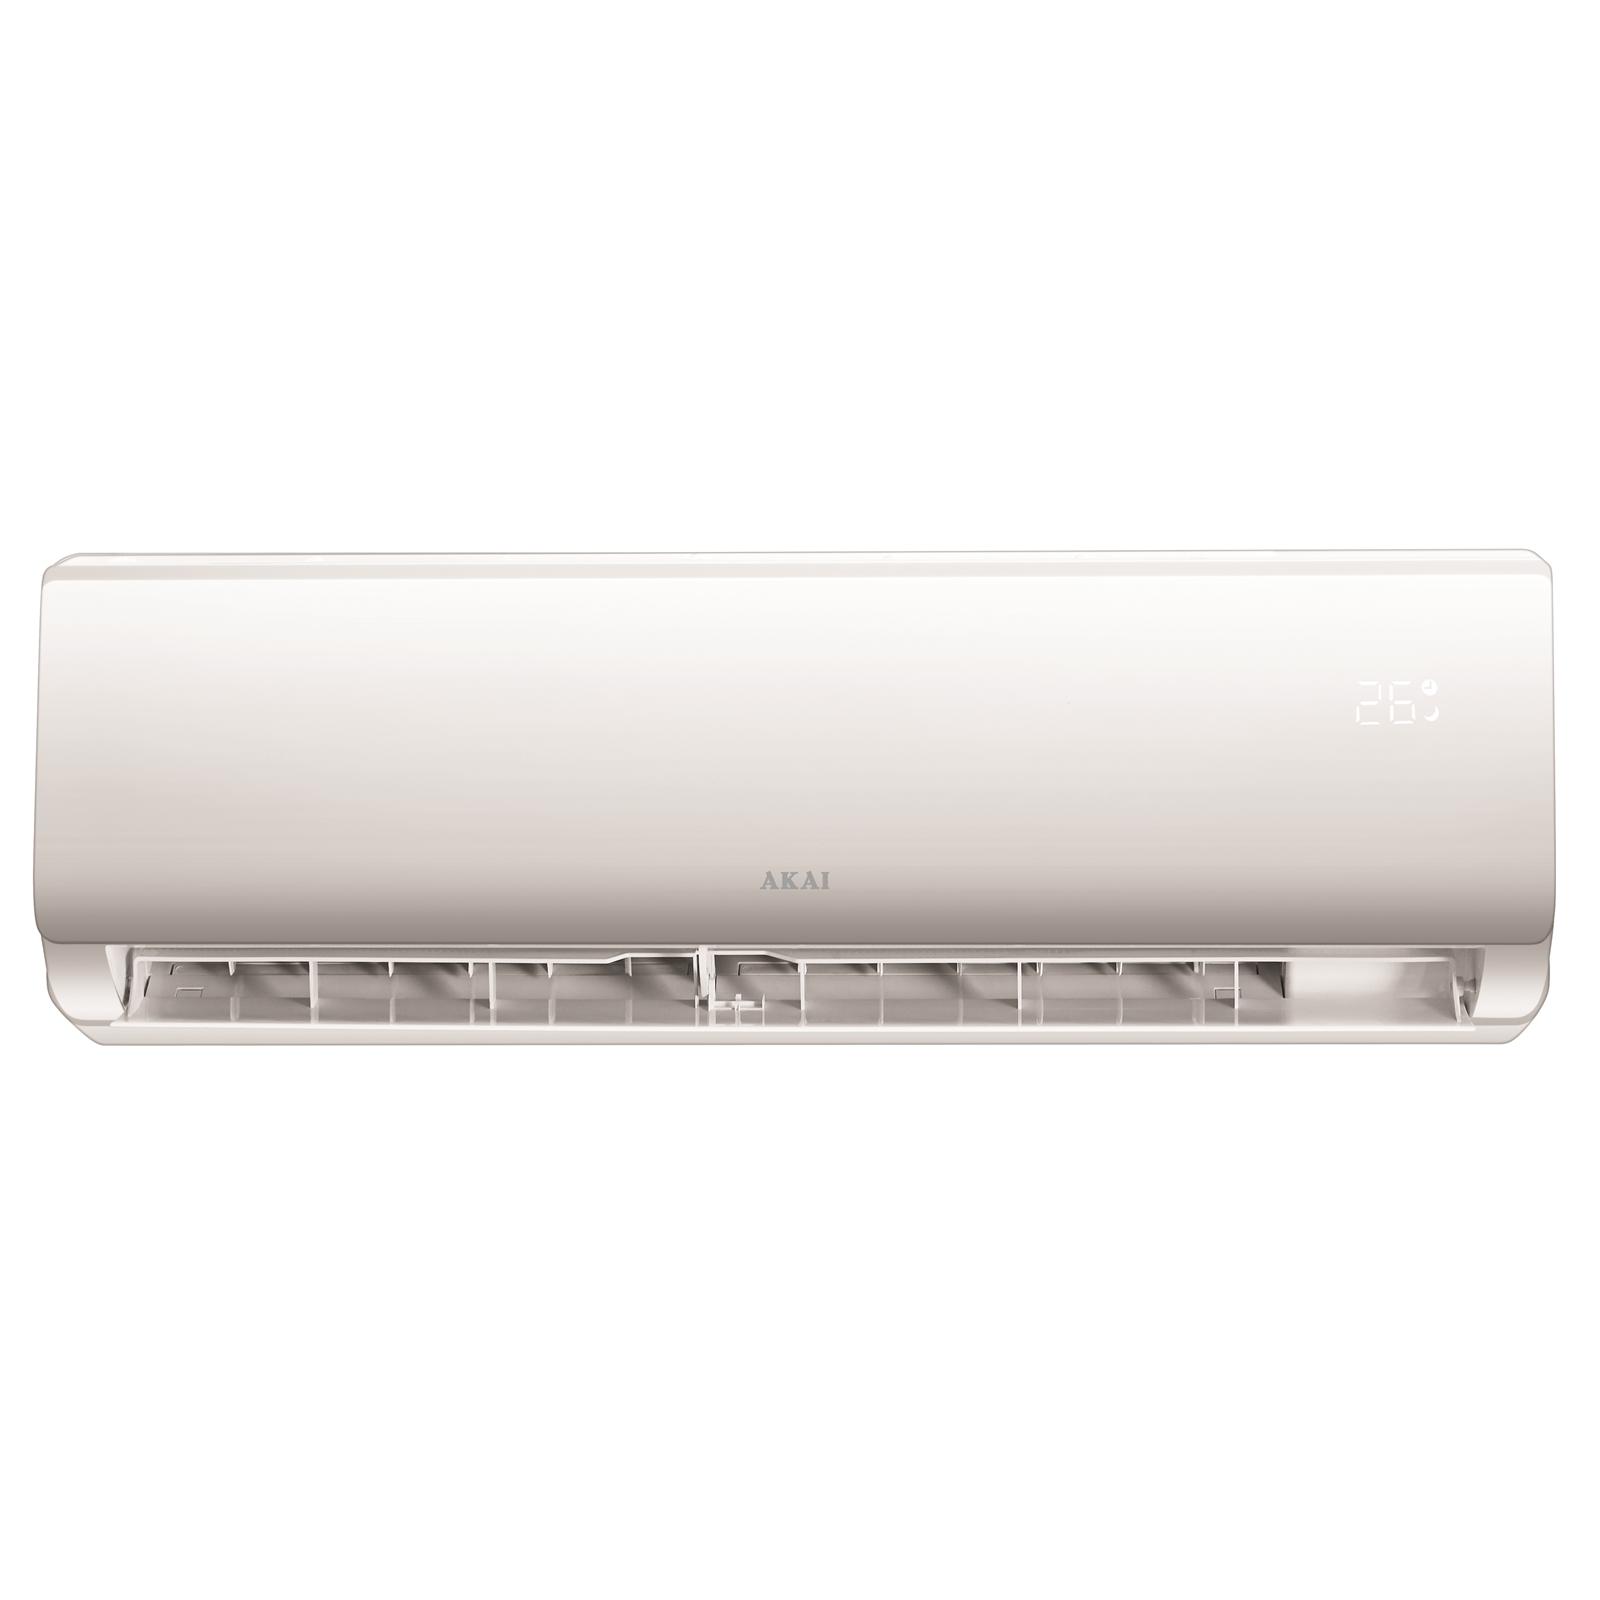 Akai 2.5kW / 2.6kW Reverse Cycle Inverter Split System Air Conditioner